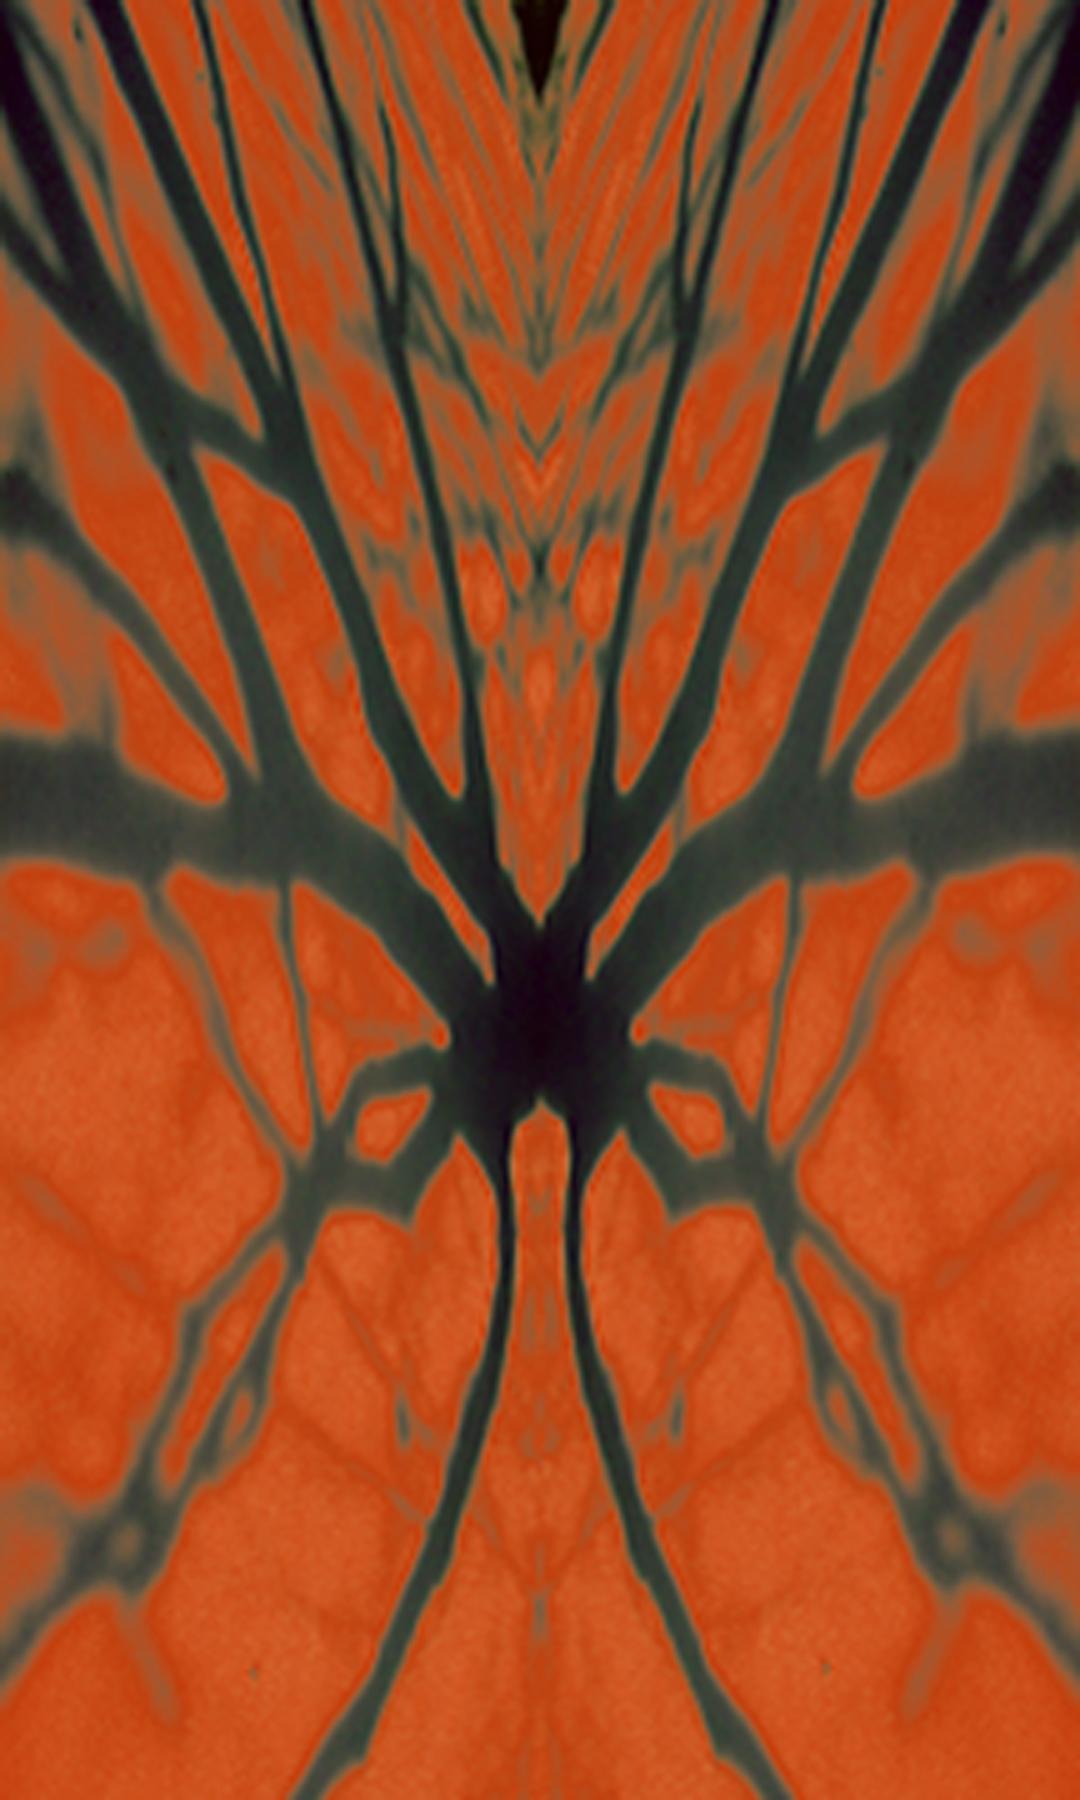 Rorschack Shadow Trilogy: Web, 2003, Screen print, 21.5 x 35.75 inches.